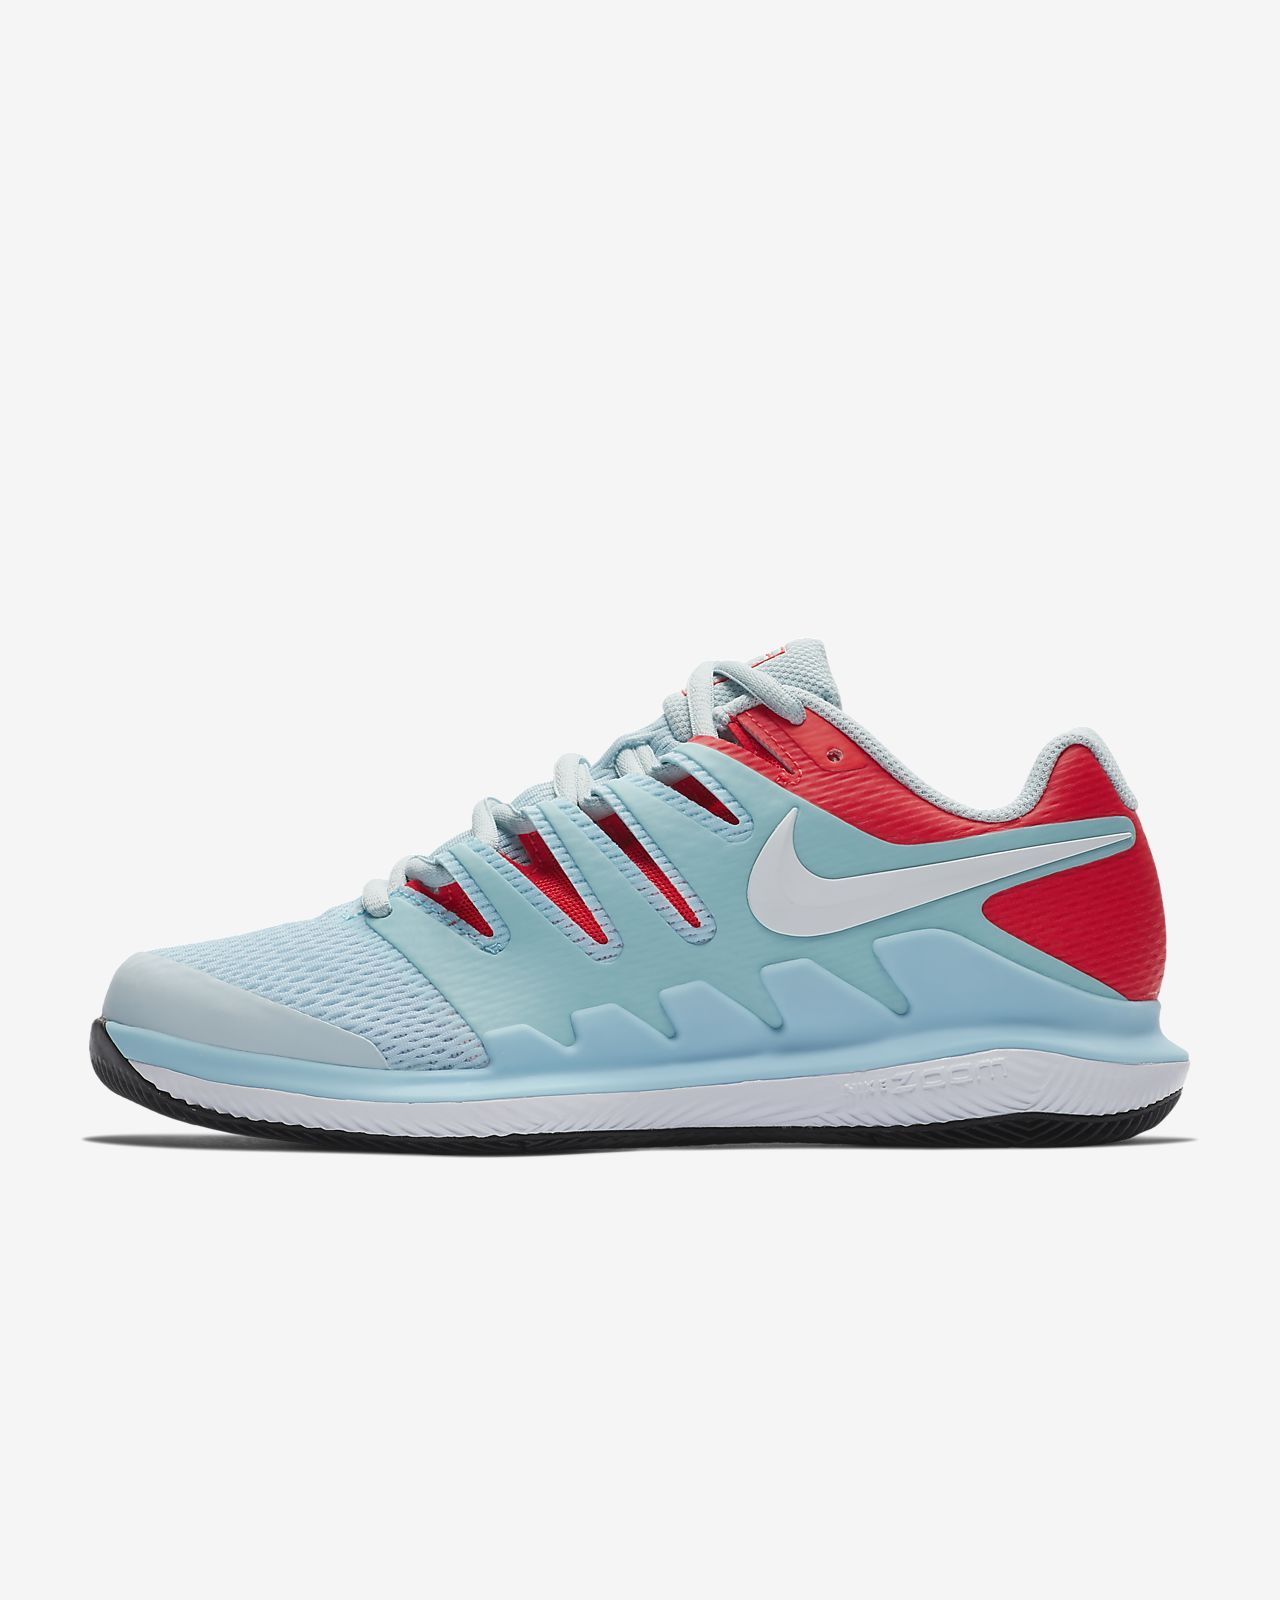 d81fa13f20 Calzado de tenis para cancha dura para mujer NikeCourt Air Zoom Vapor X